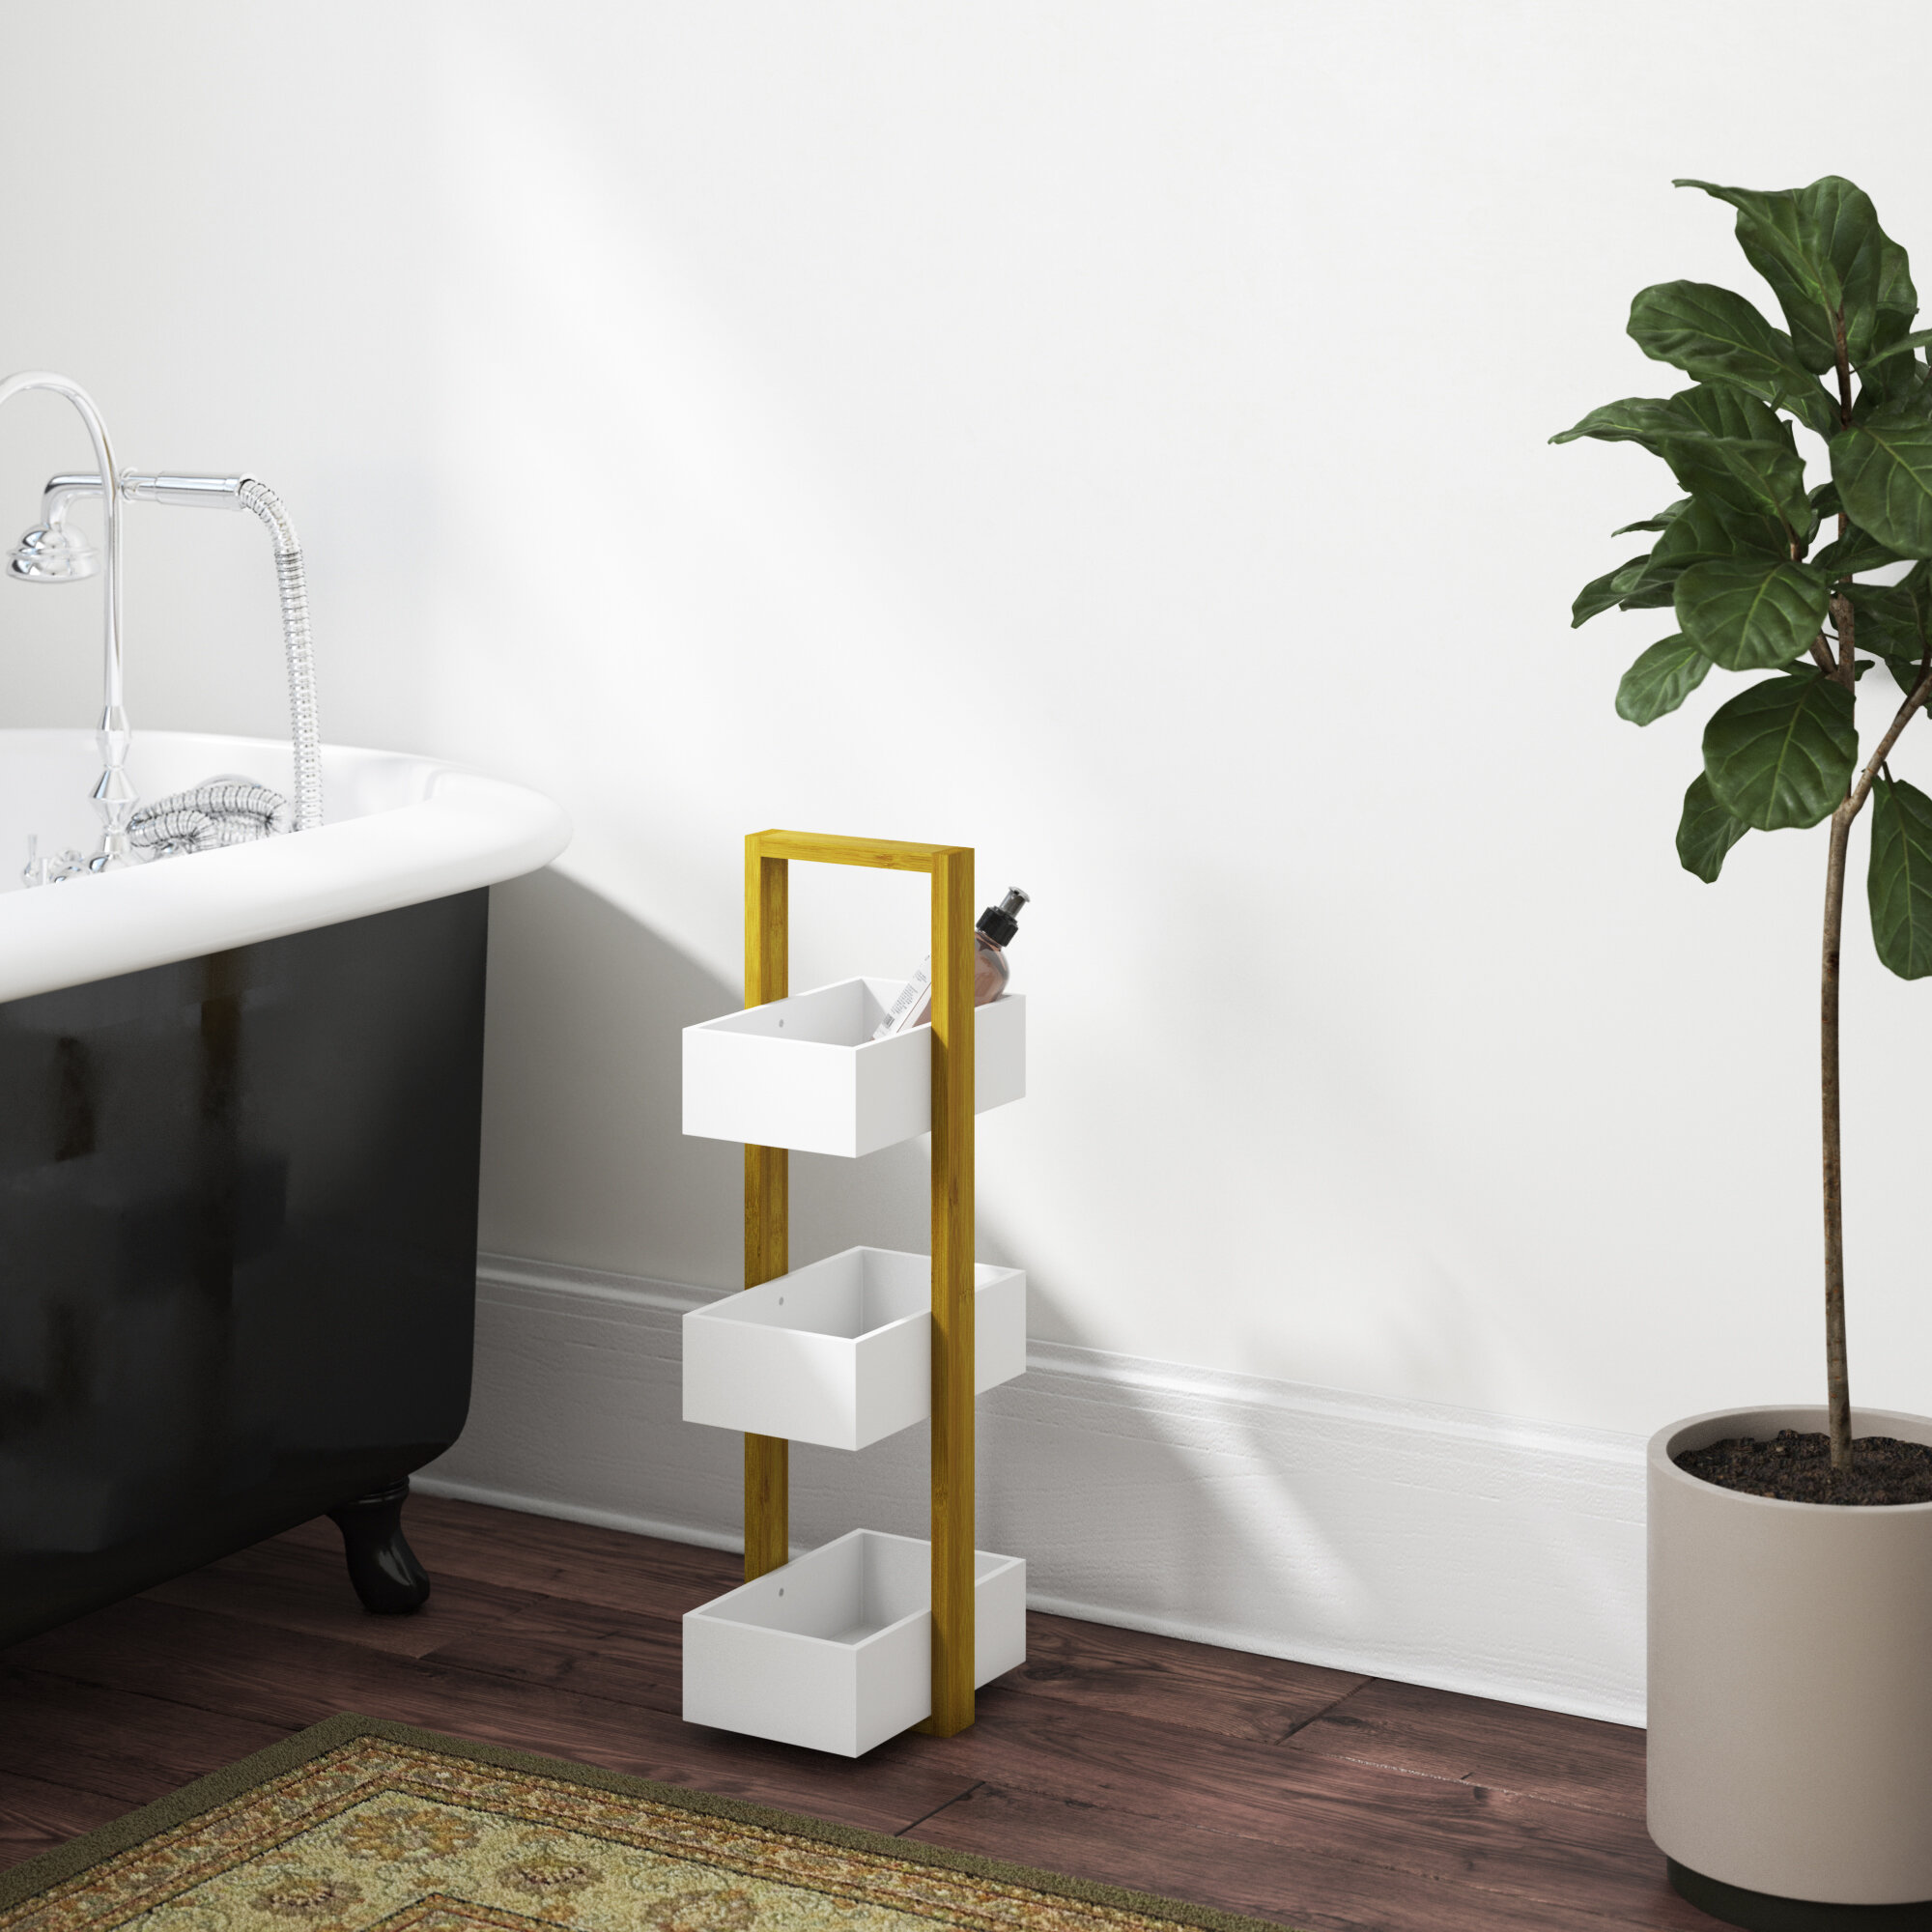 18 5 X 66 8cm Bathroom Storage Tray